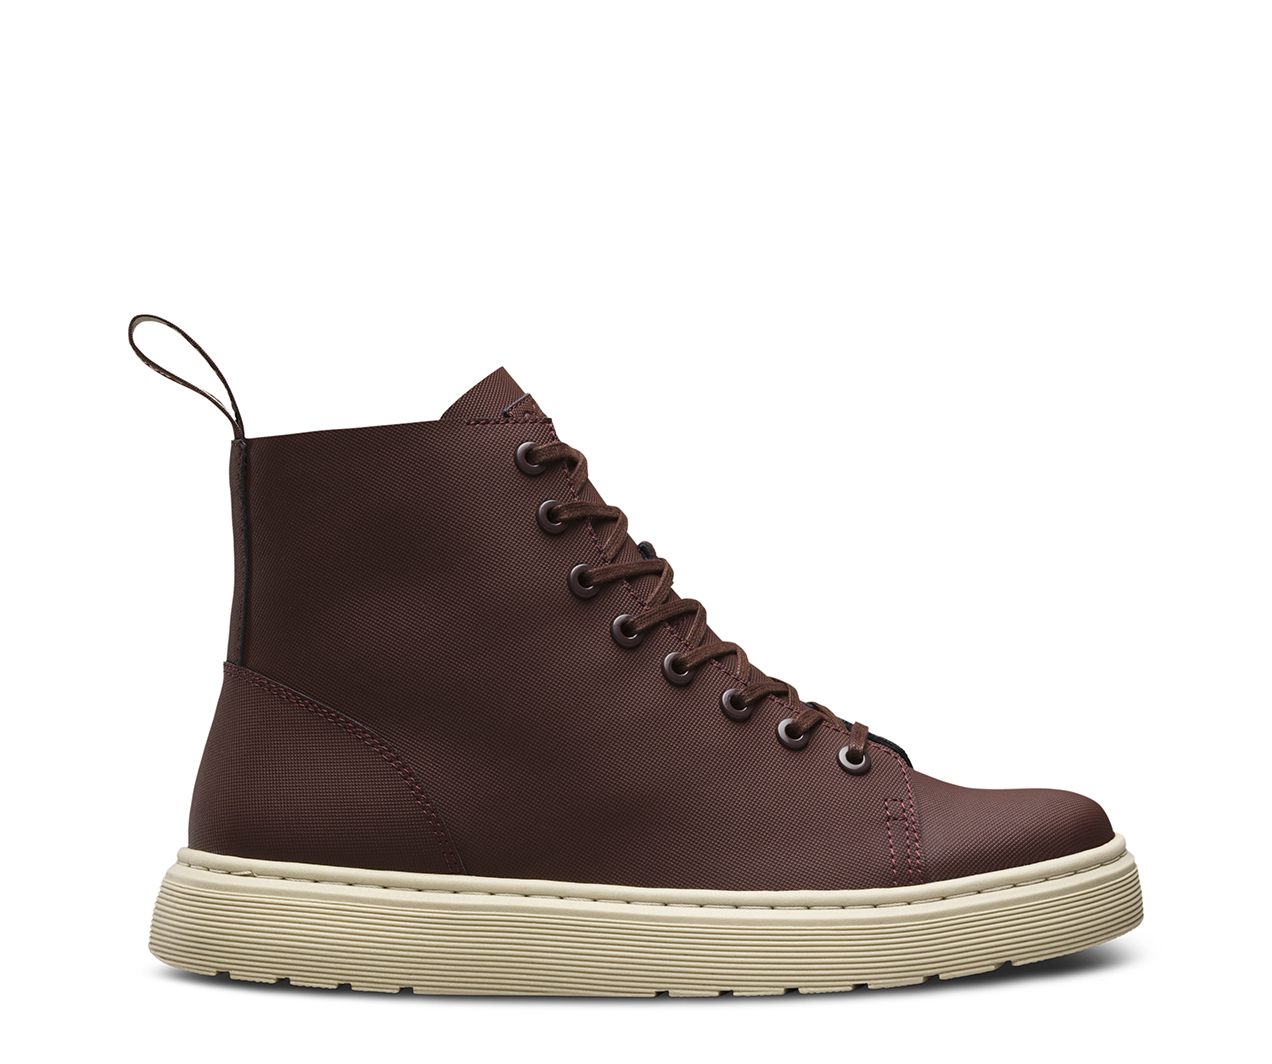 Cheap Sale Online Choice Unisex Adults Talib Black Ajax Boots Dr. Martens Top Quality Sale Online U1NgegLO